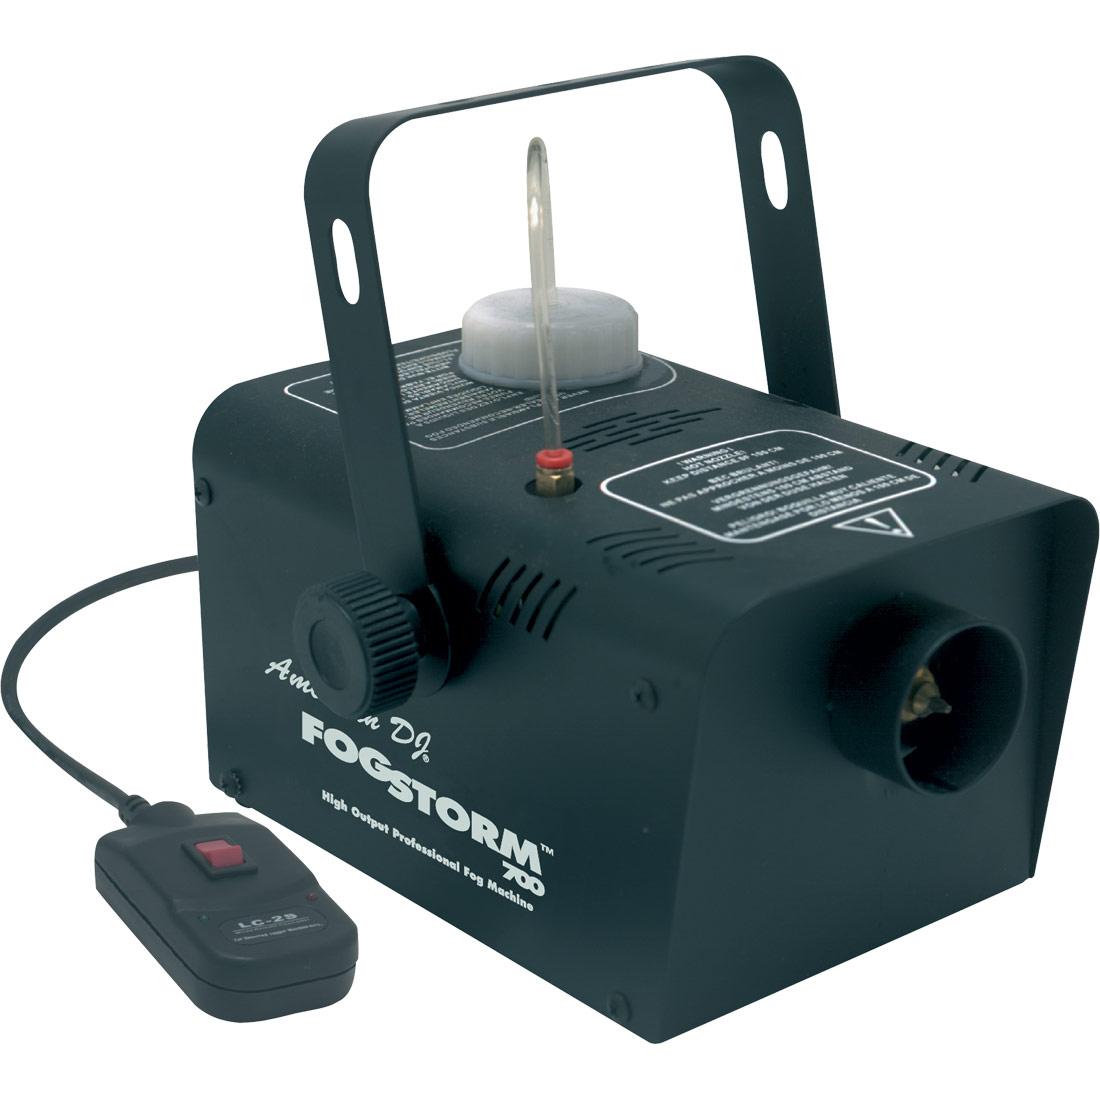 Fogstorm 700 - 700W Fogmachine